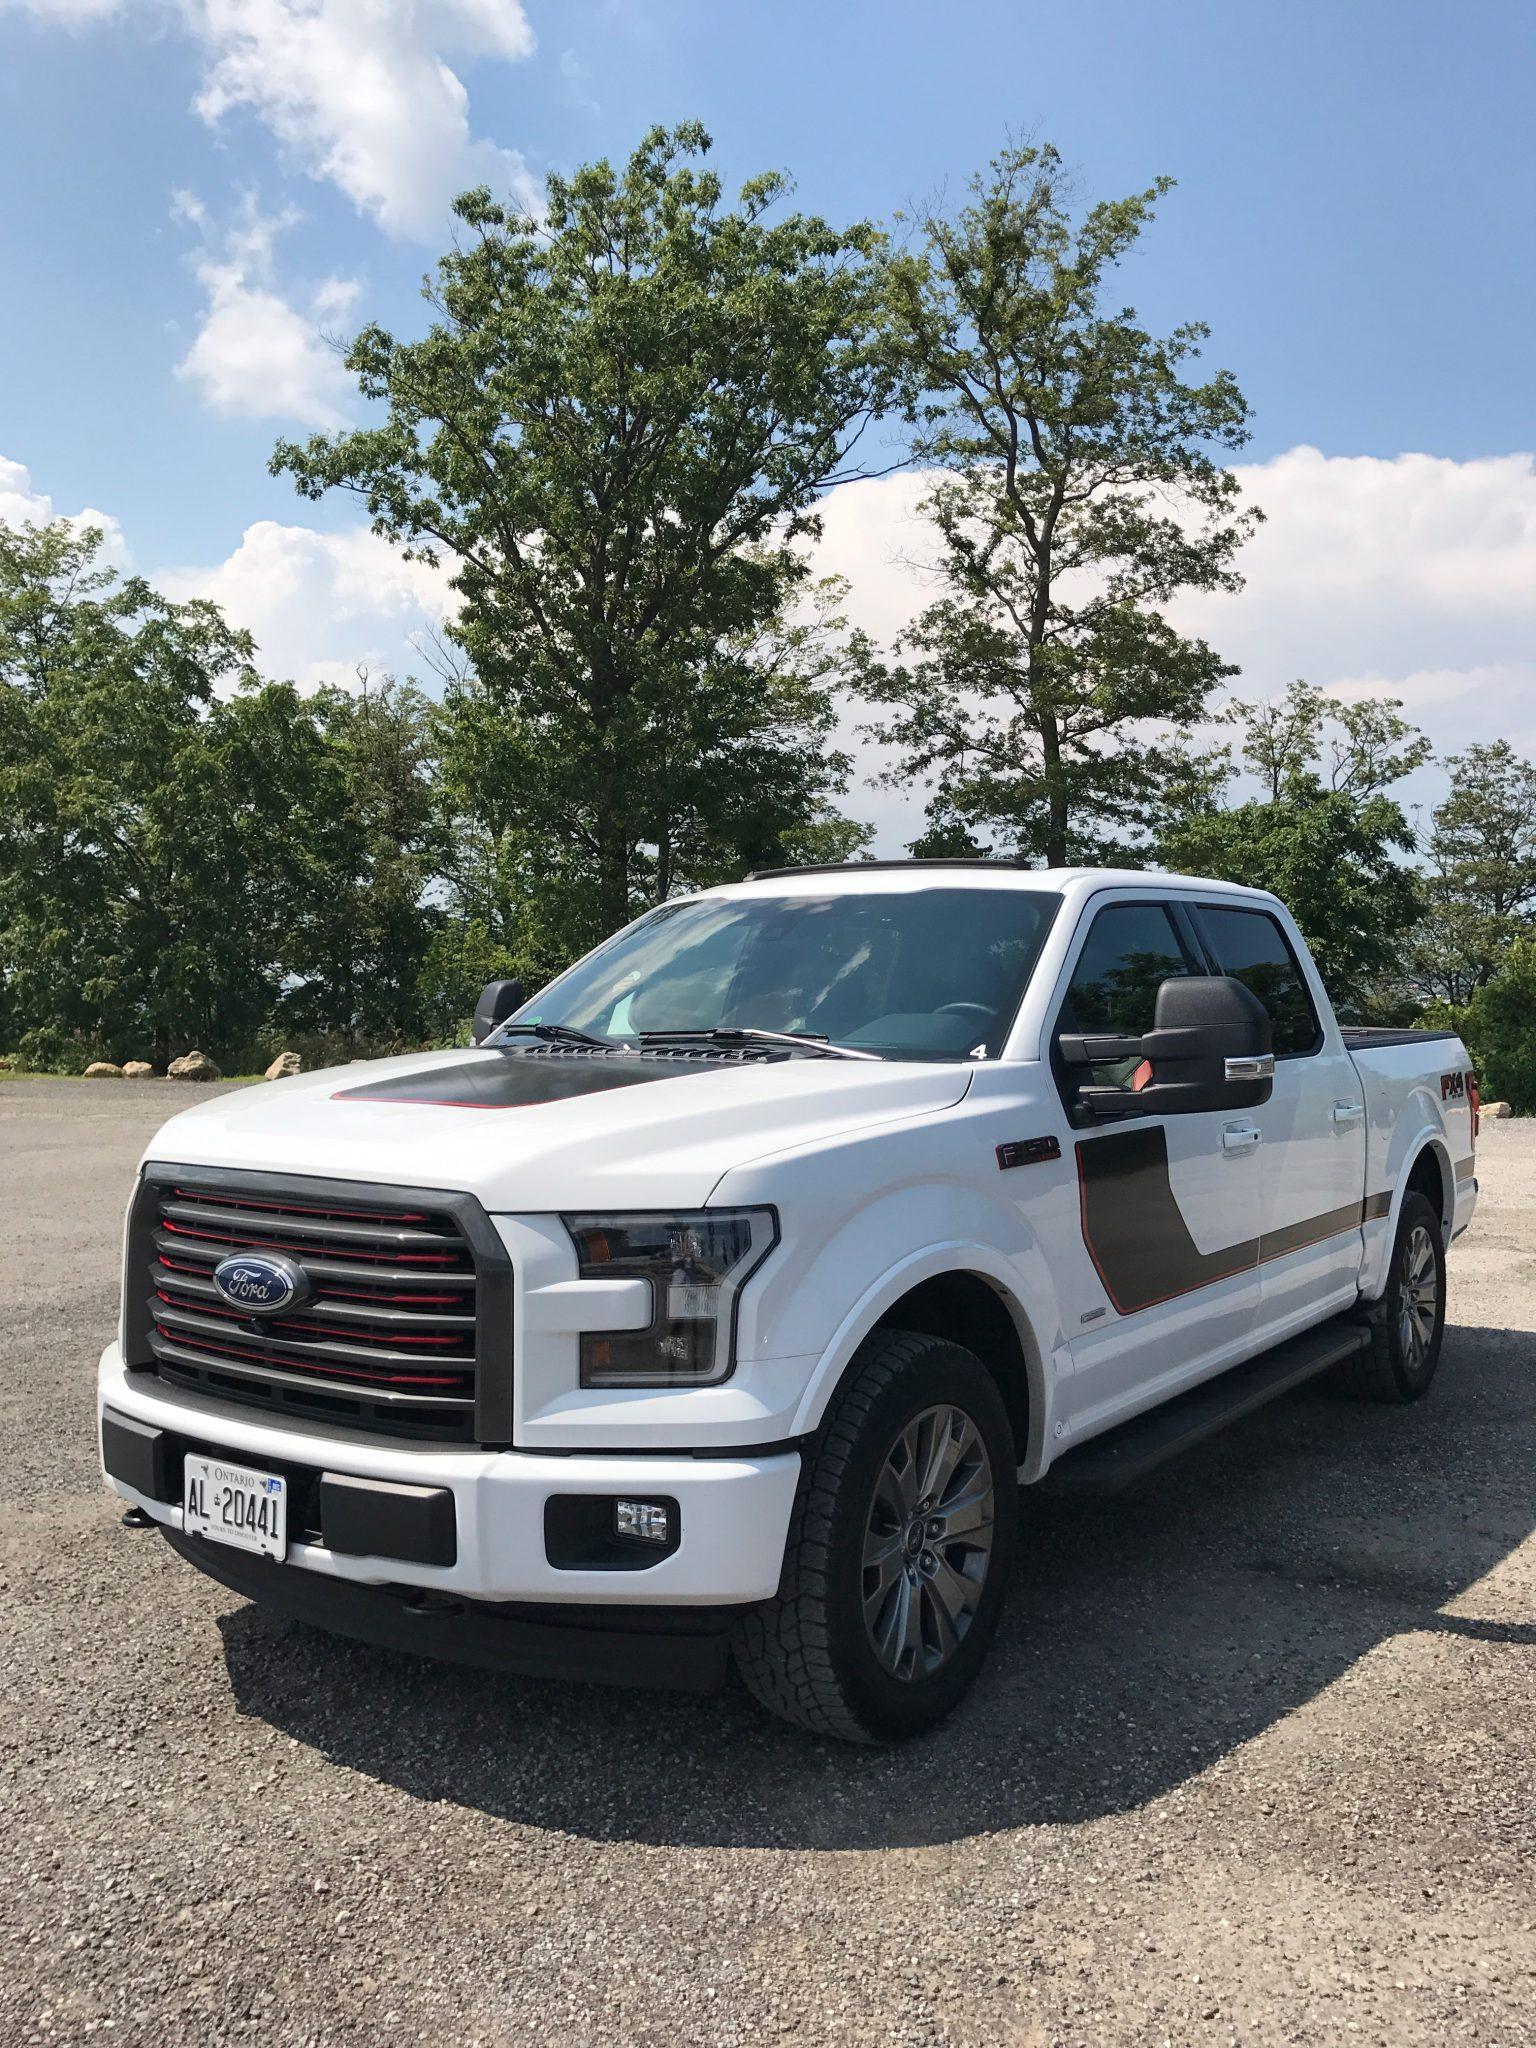 Ford Canada Road Trip sparkleshinylove